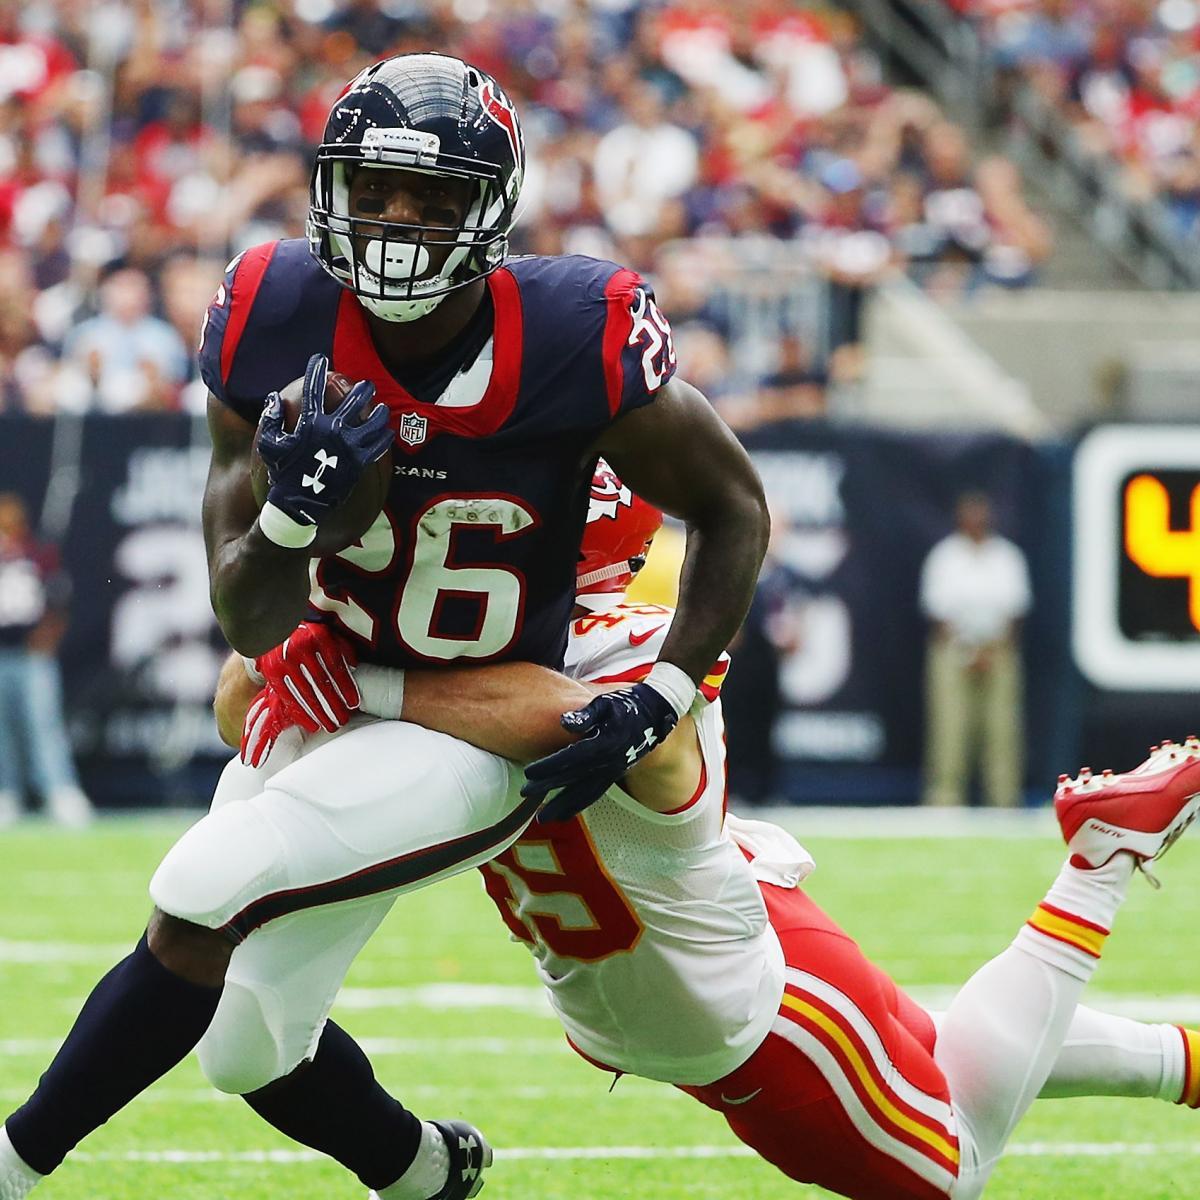 Denver Broncos Vs Detroit Lions Live Score Highlights And: Lamar Miller Injury: Updates On Texans Star's Shoulder And